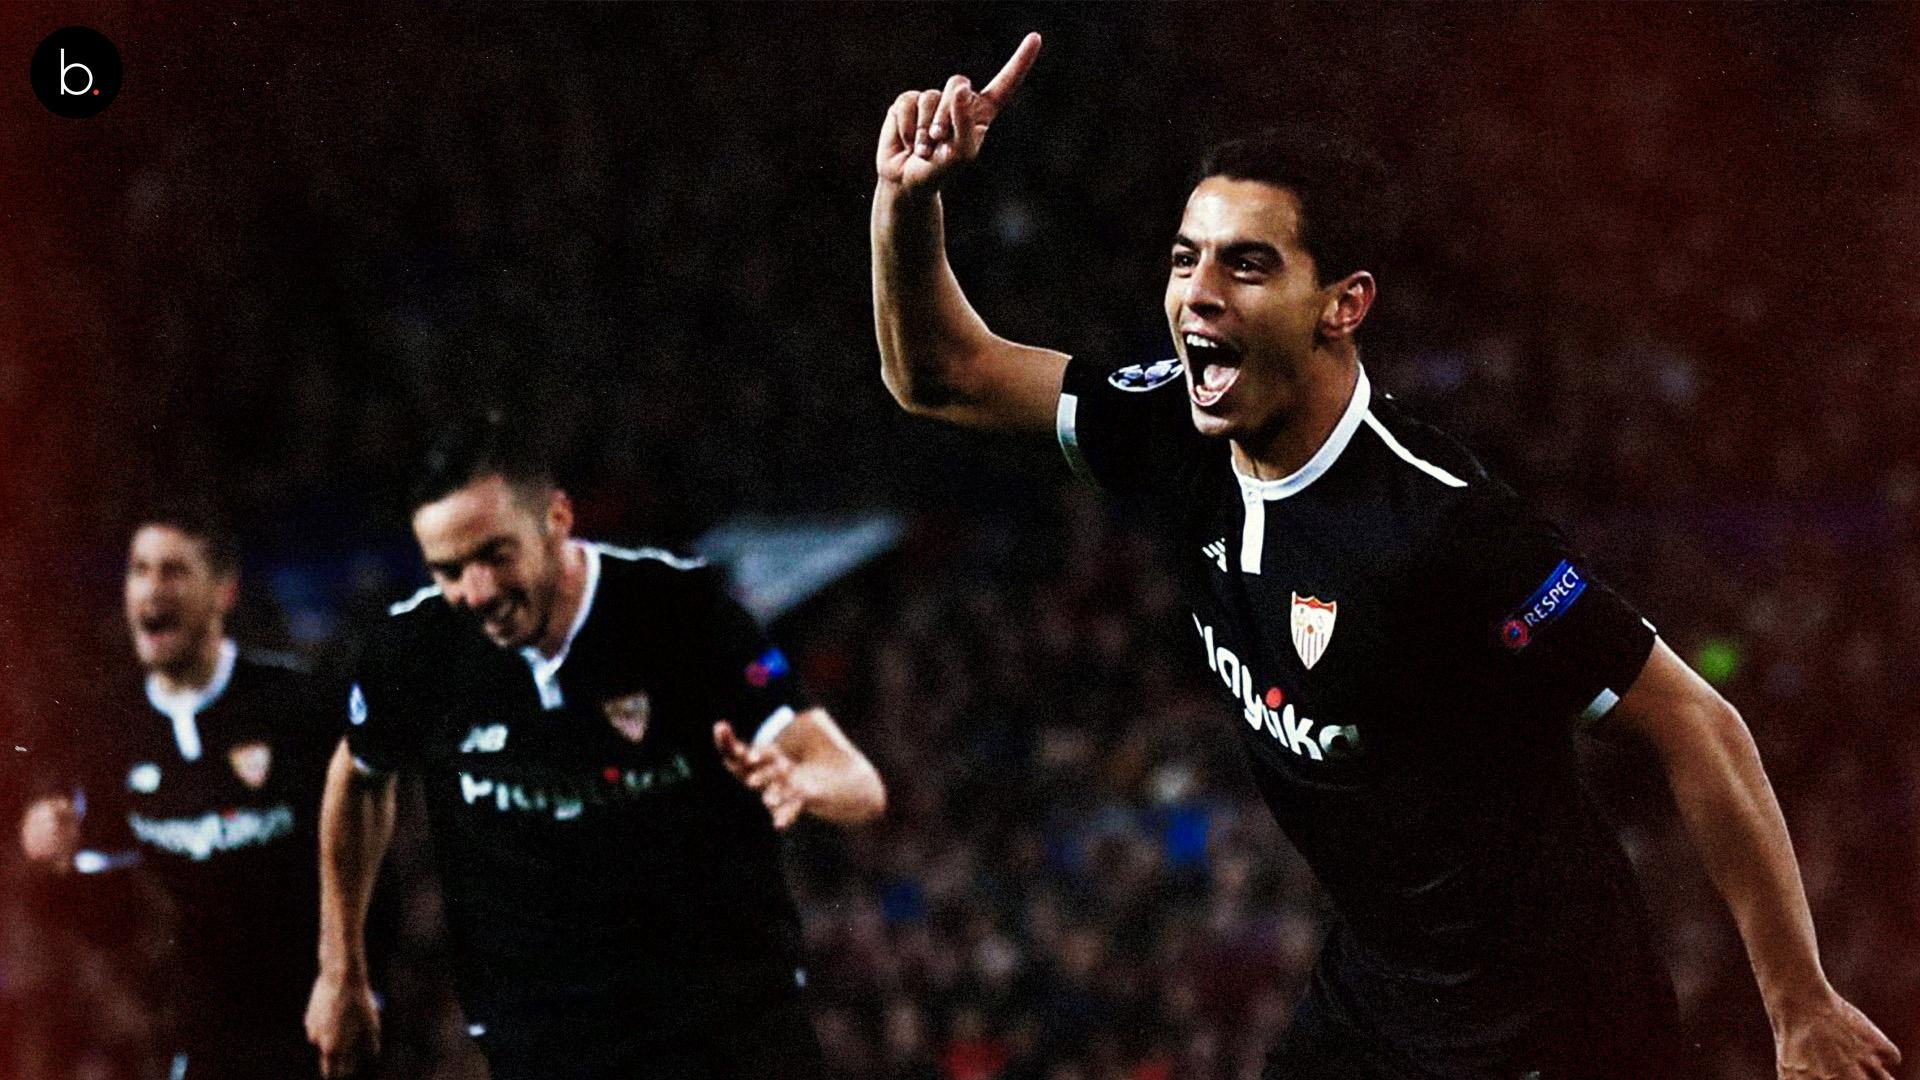 El Sevilla consigue eliminar al United de Mourinho de la Champions